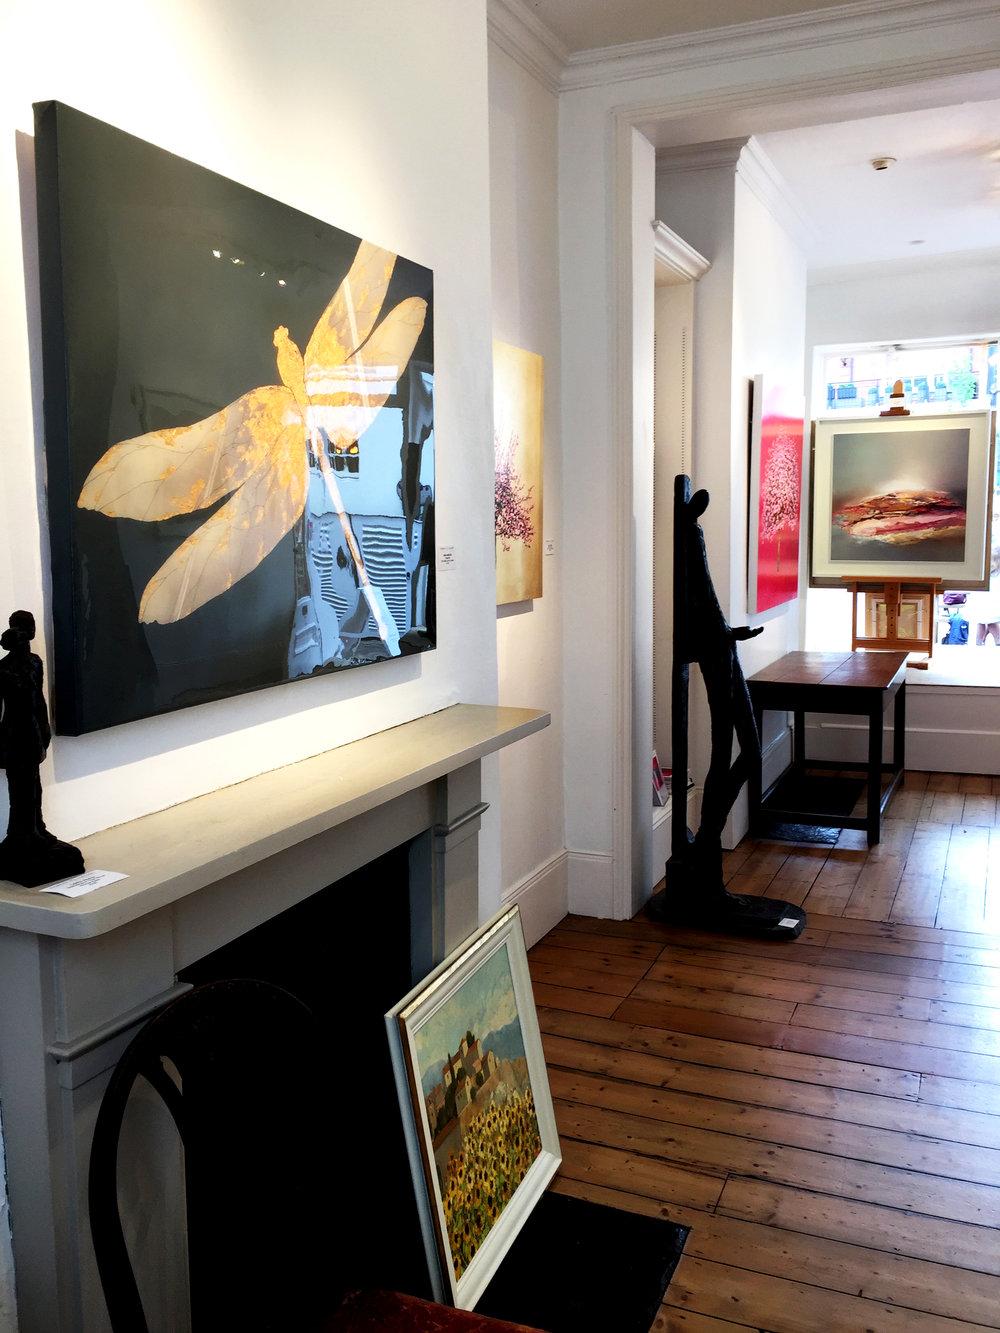 DRAGONFLY painting at Fairfax Gallery Tunbridge Wells